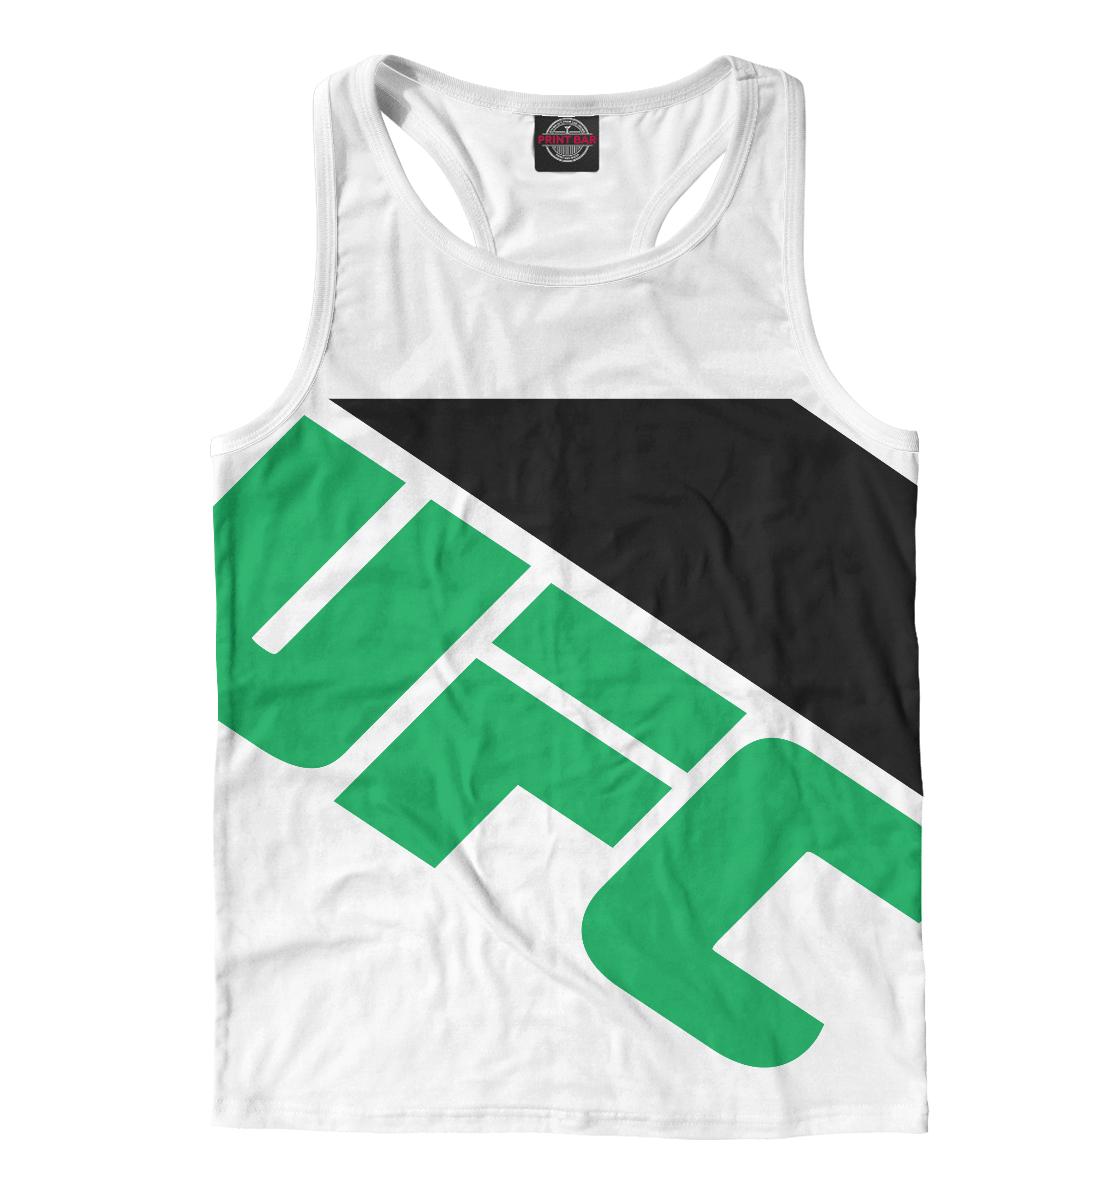 Купить Конор МакГрегор UFC, Printbar, Майки борцовки, MCG-842181-mayb-2